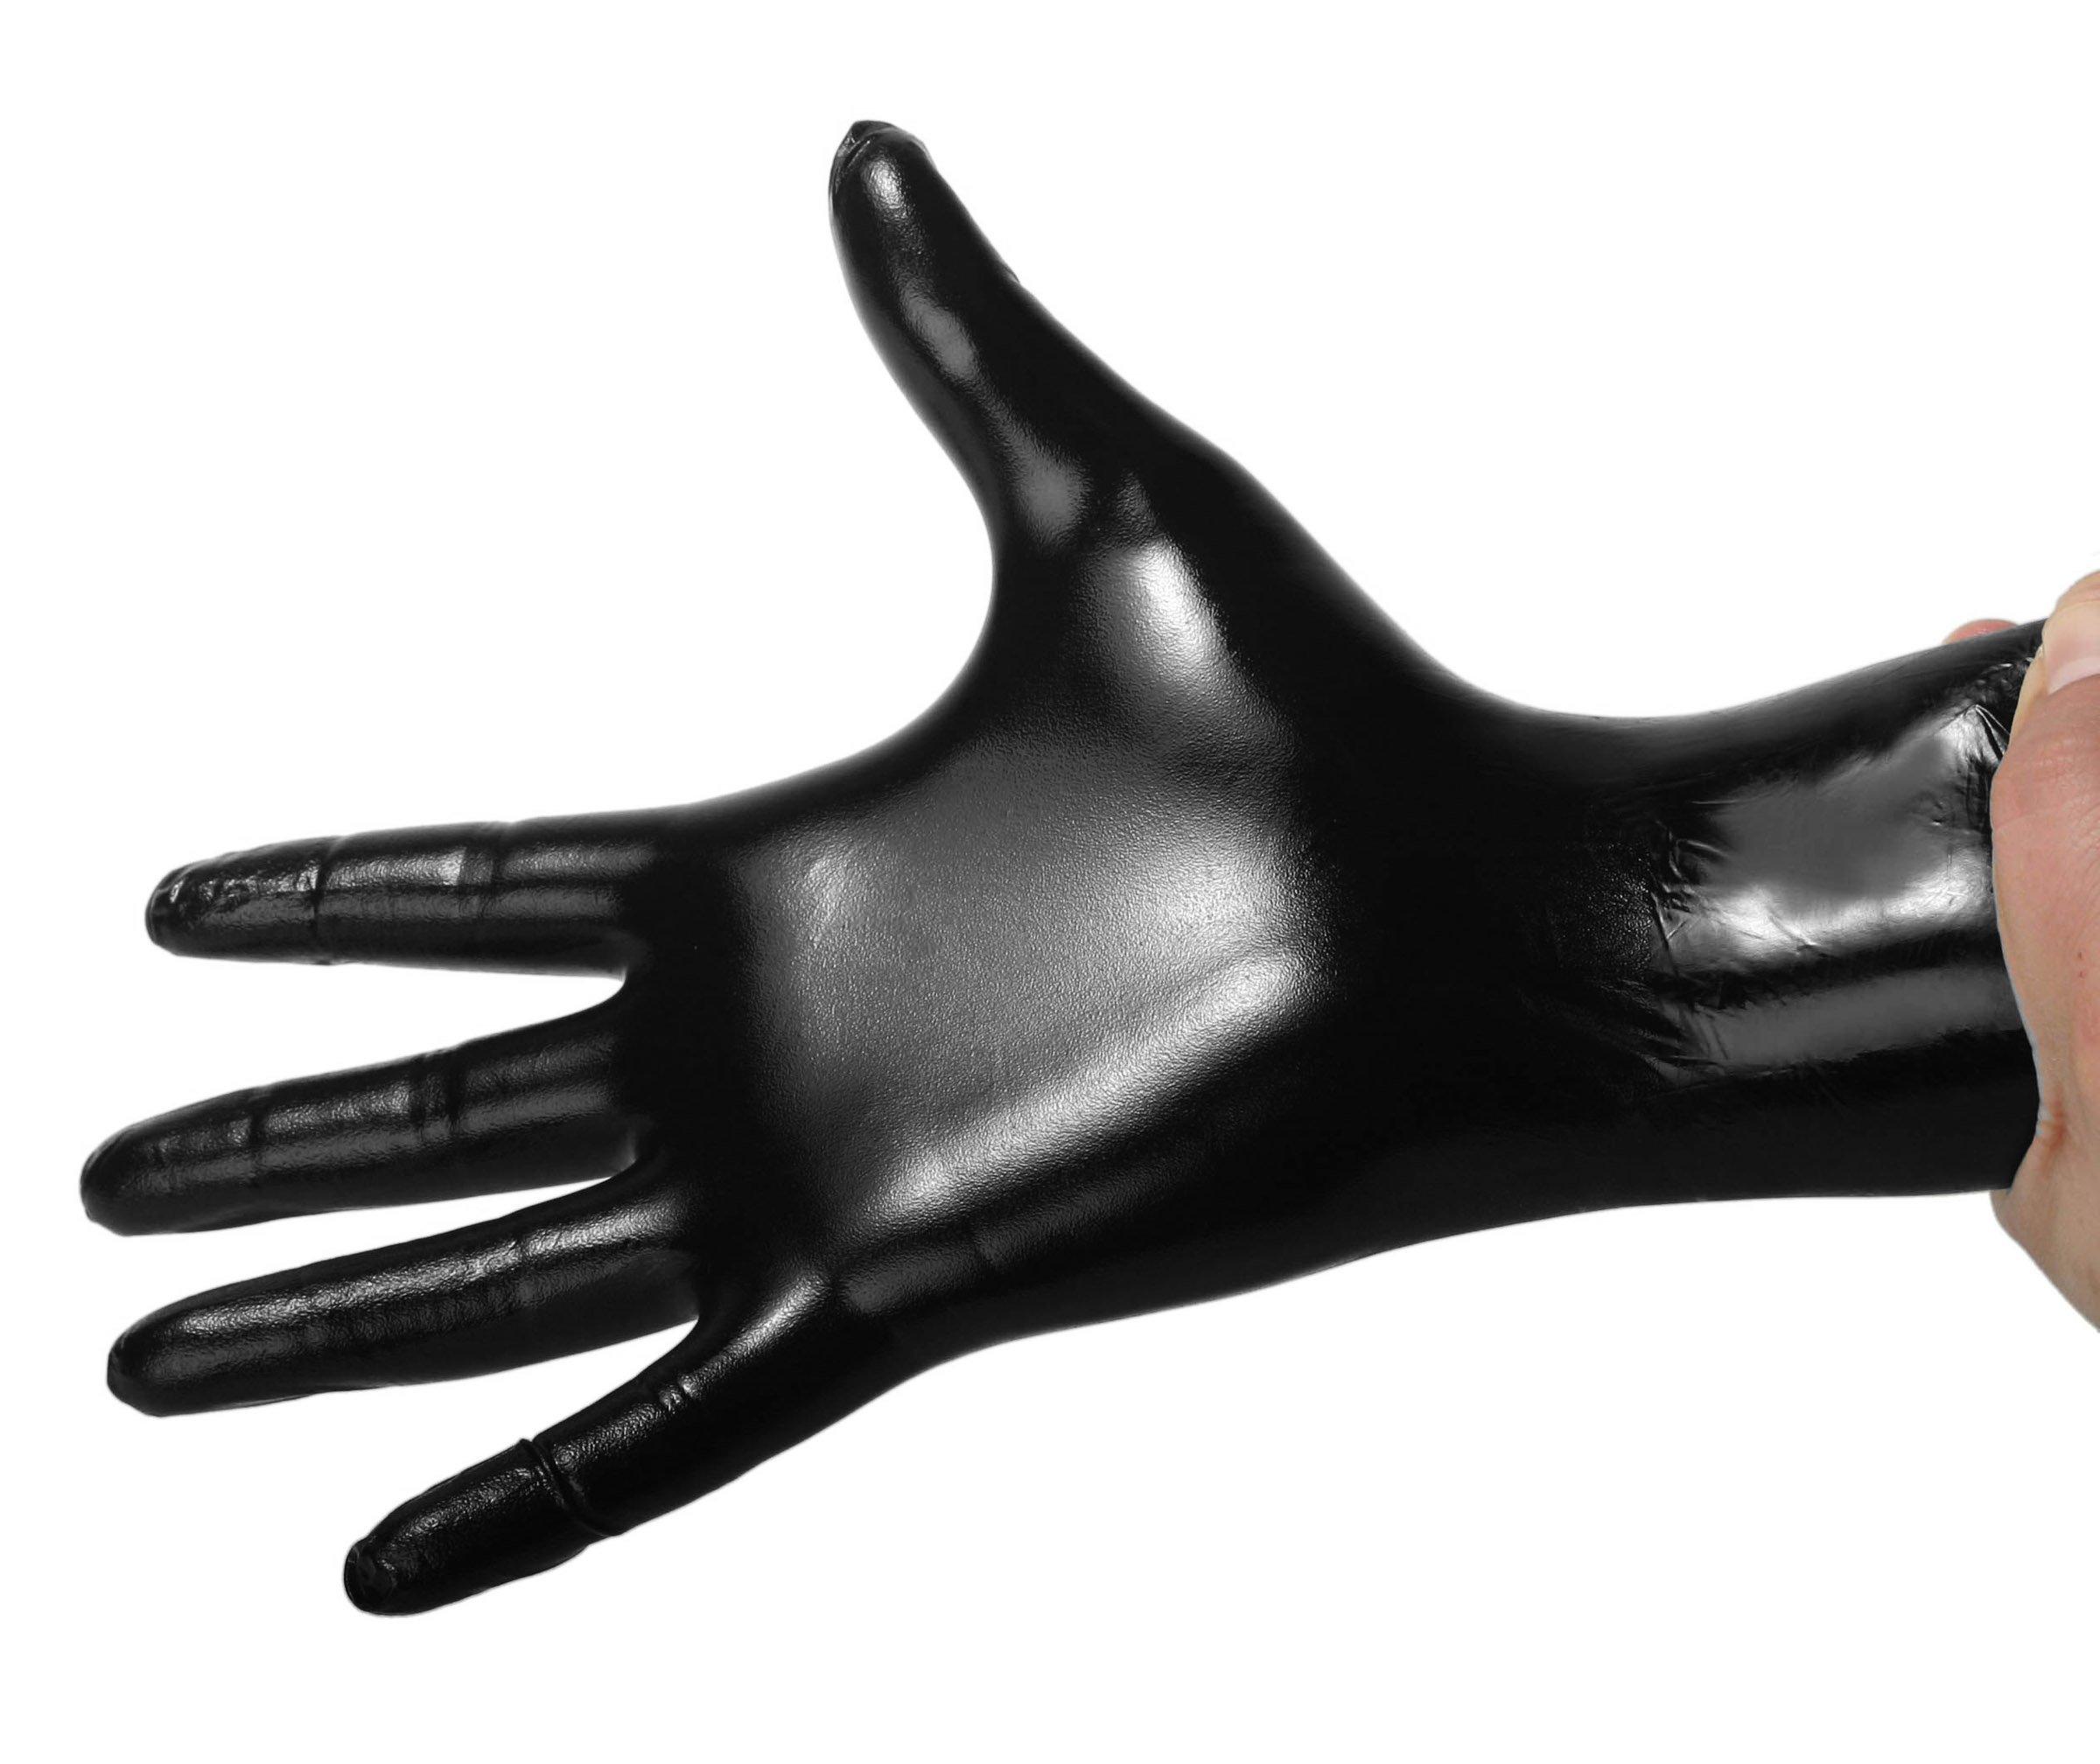 Black Nitrile Examination Gloves - Large - 100 count